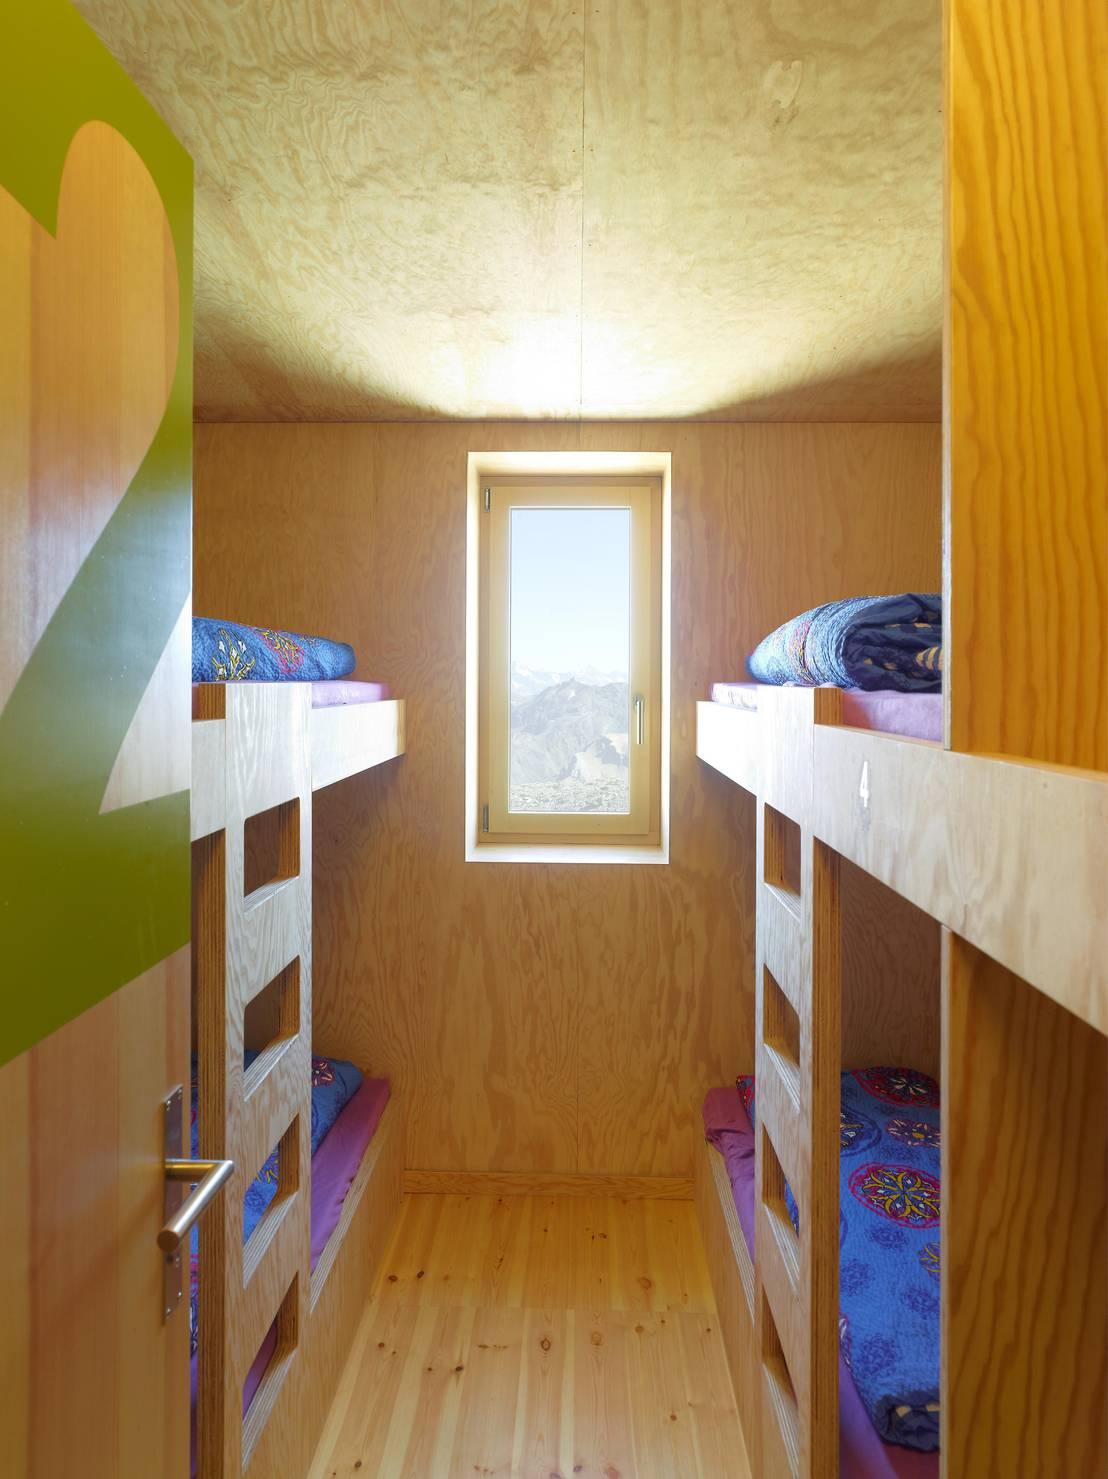 nouvelle cabane de tracuit di savioz fabrizzi architectes homify. Black Bedroom Furniture Sets. Home Design Ideas